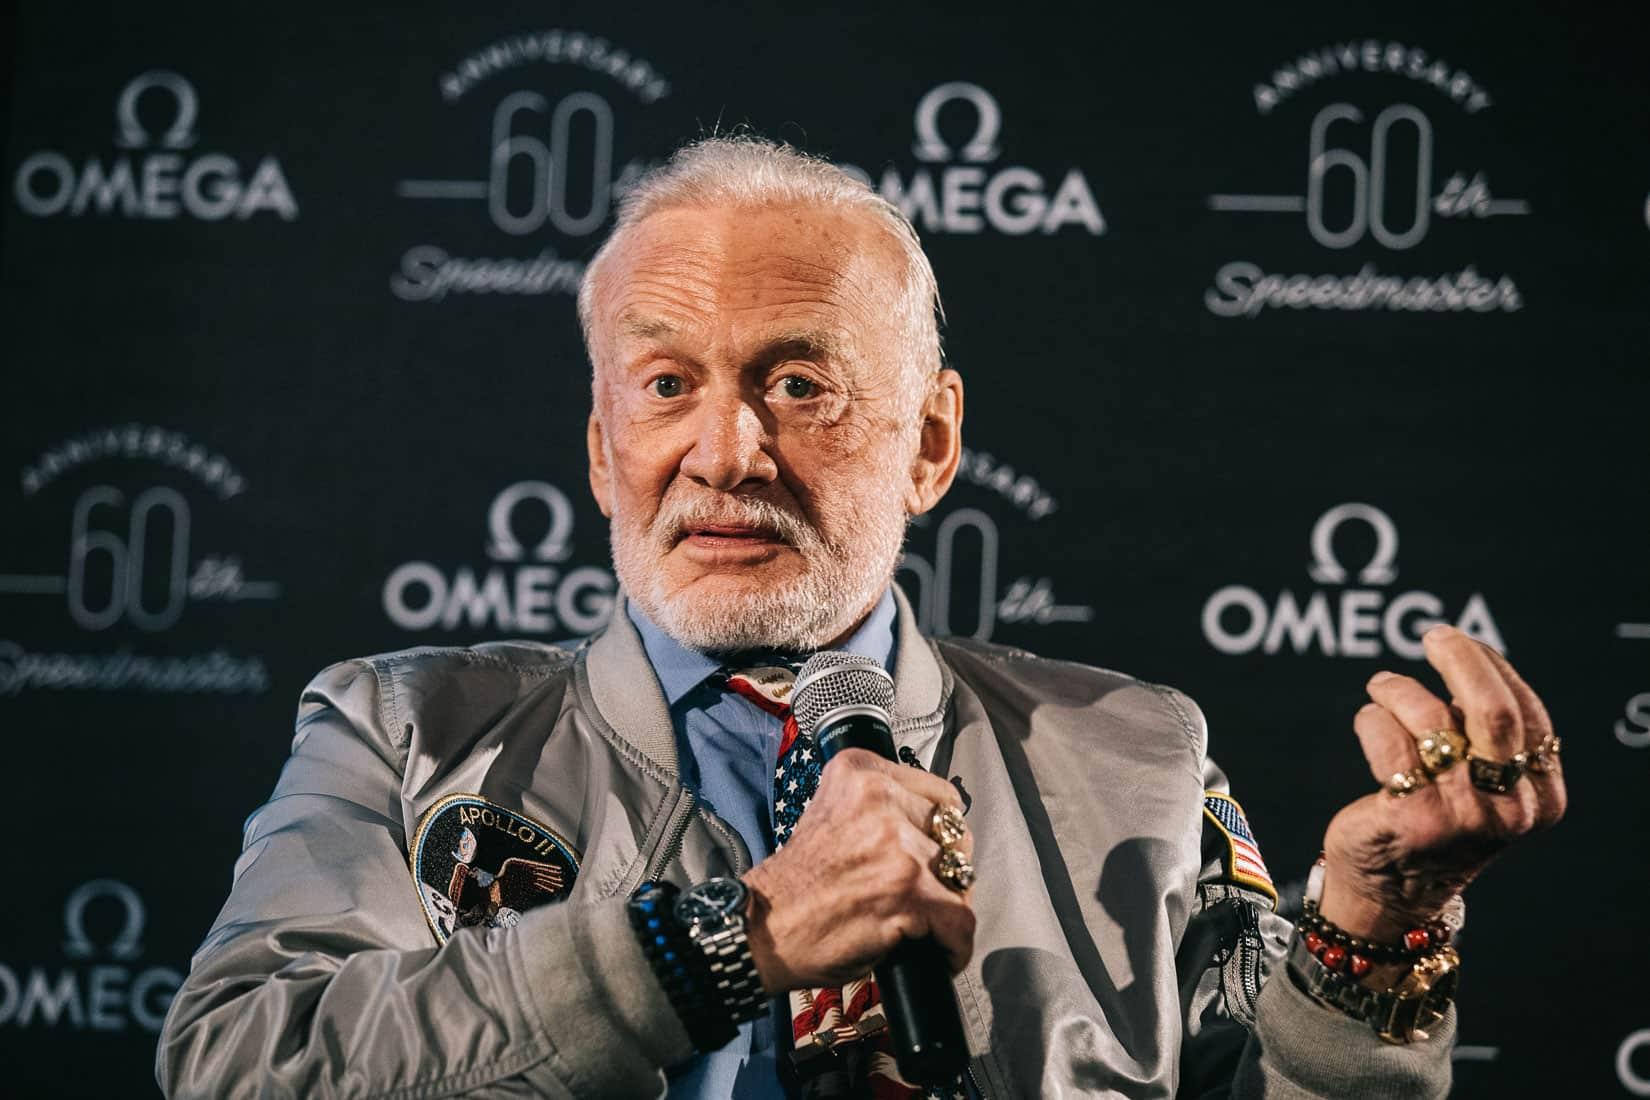 Weekend Read Speedmaster Event In London With Buzz Aldrin